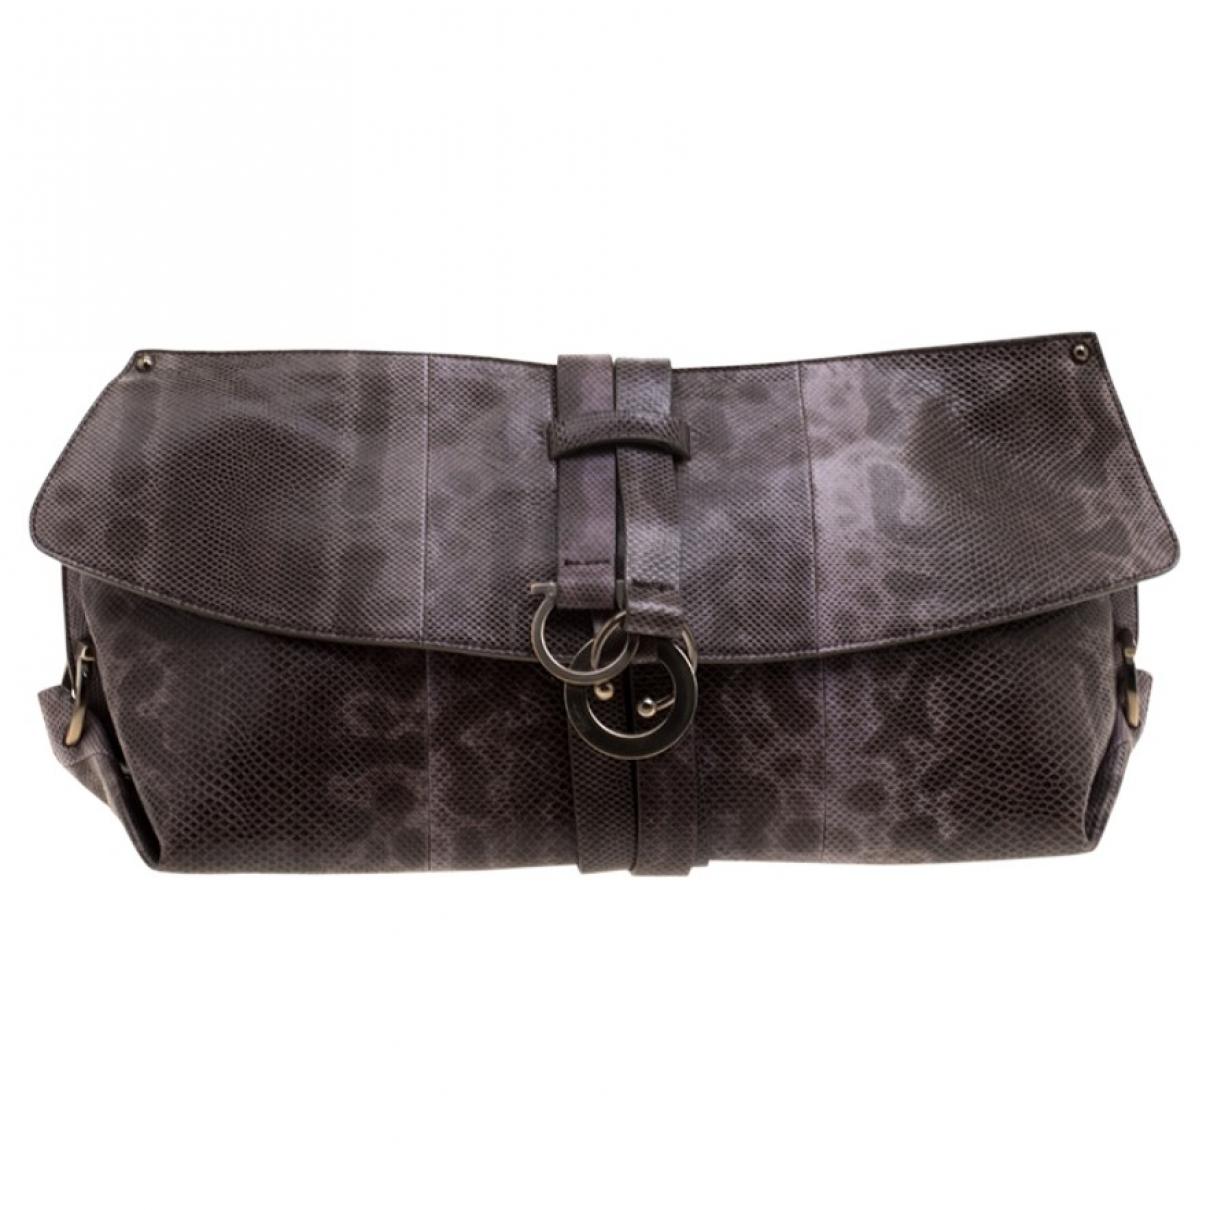 Salvatore Ferragamo \N Beige Leather Clutch bag for Women \N